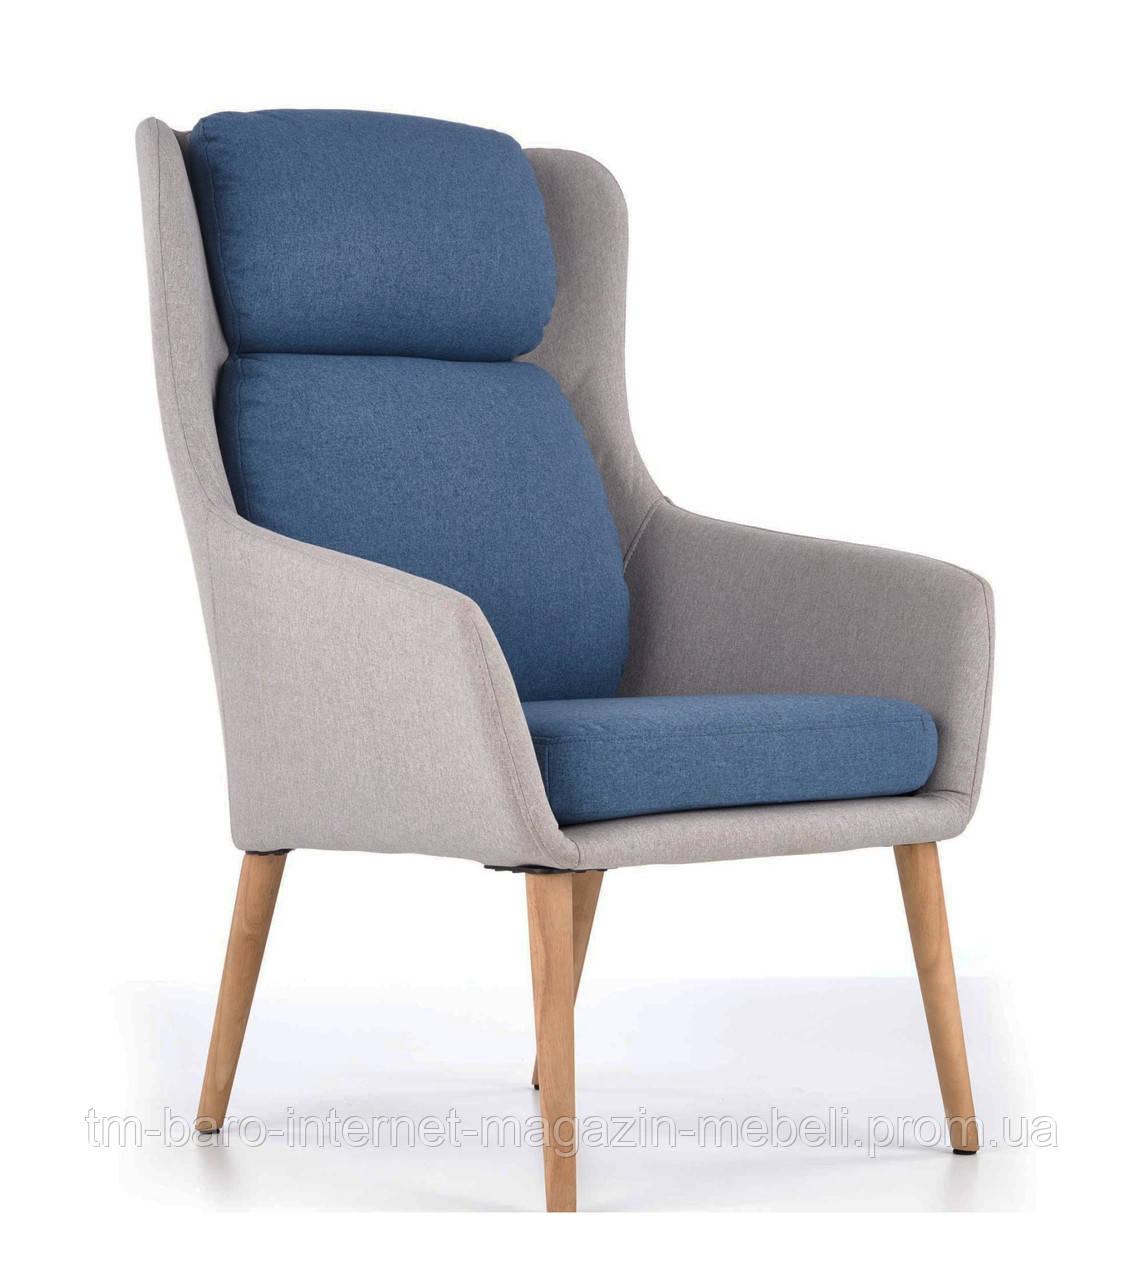 Кресло Purio (Пурио) светло-серый/синий, ткань, Halmar